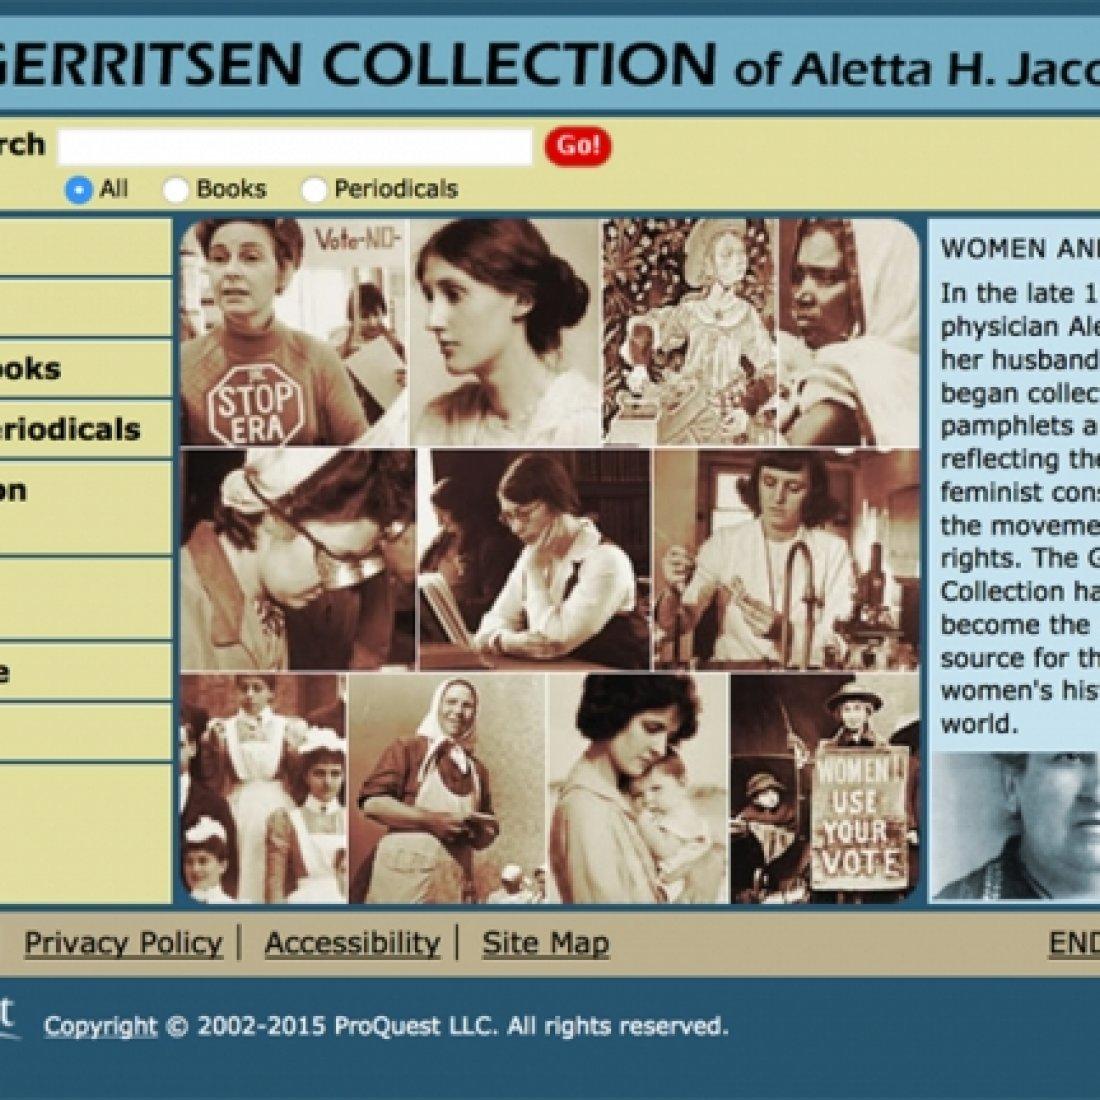 The Gerritsen Collection in Atria 2008